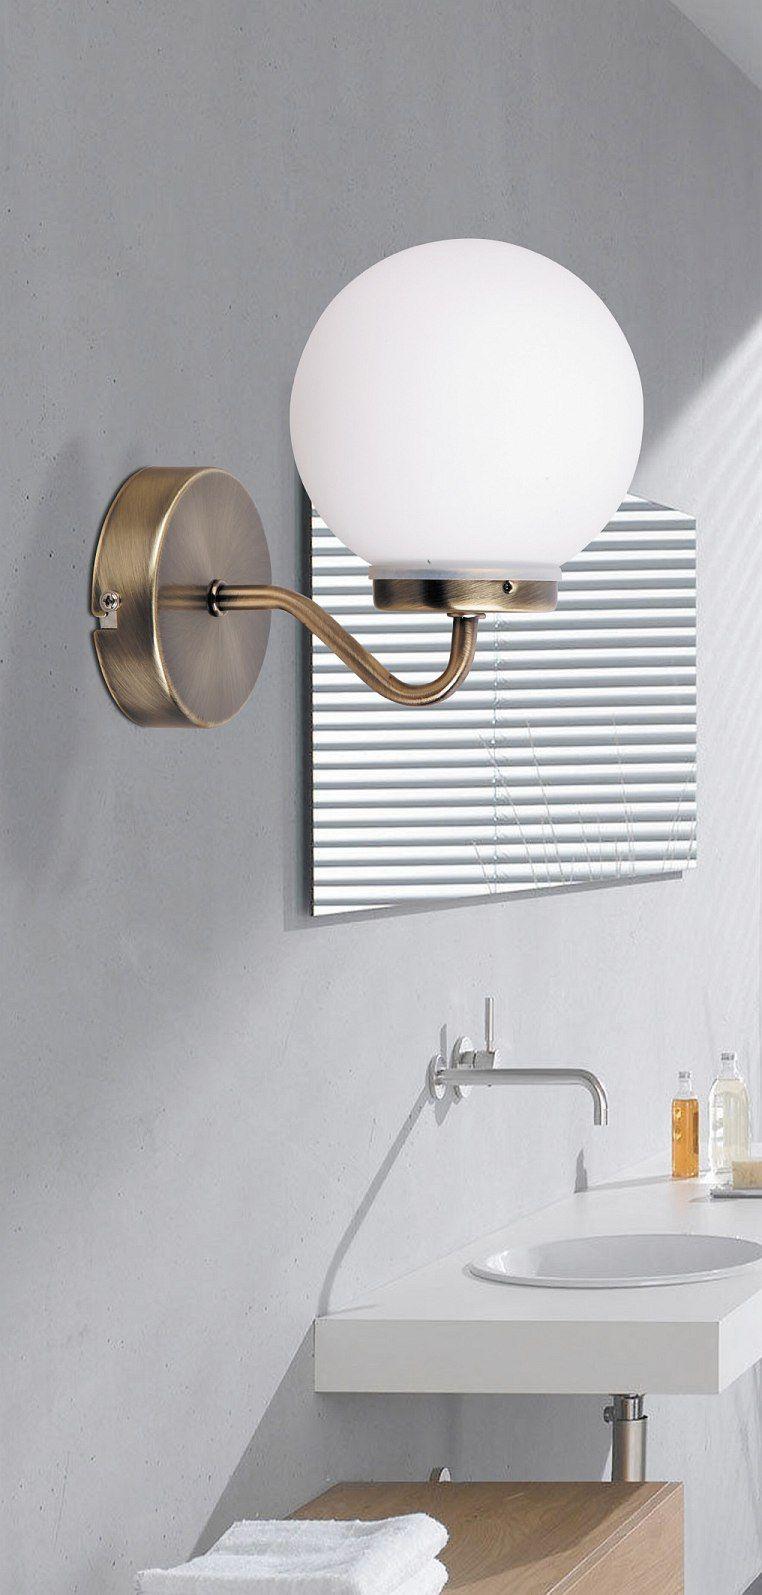 Rábalux Togo 1302 fürdőszobai falikar, 1x40W E14